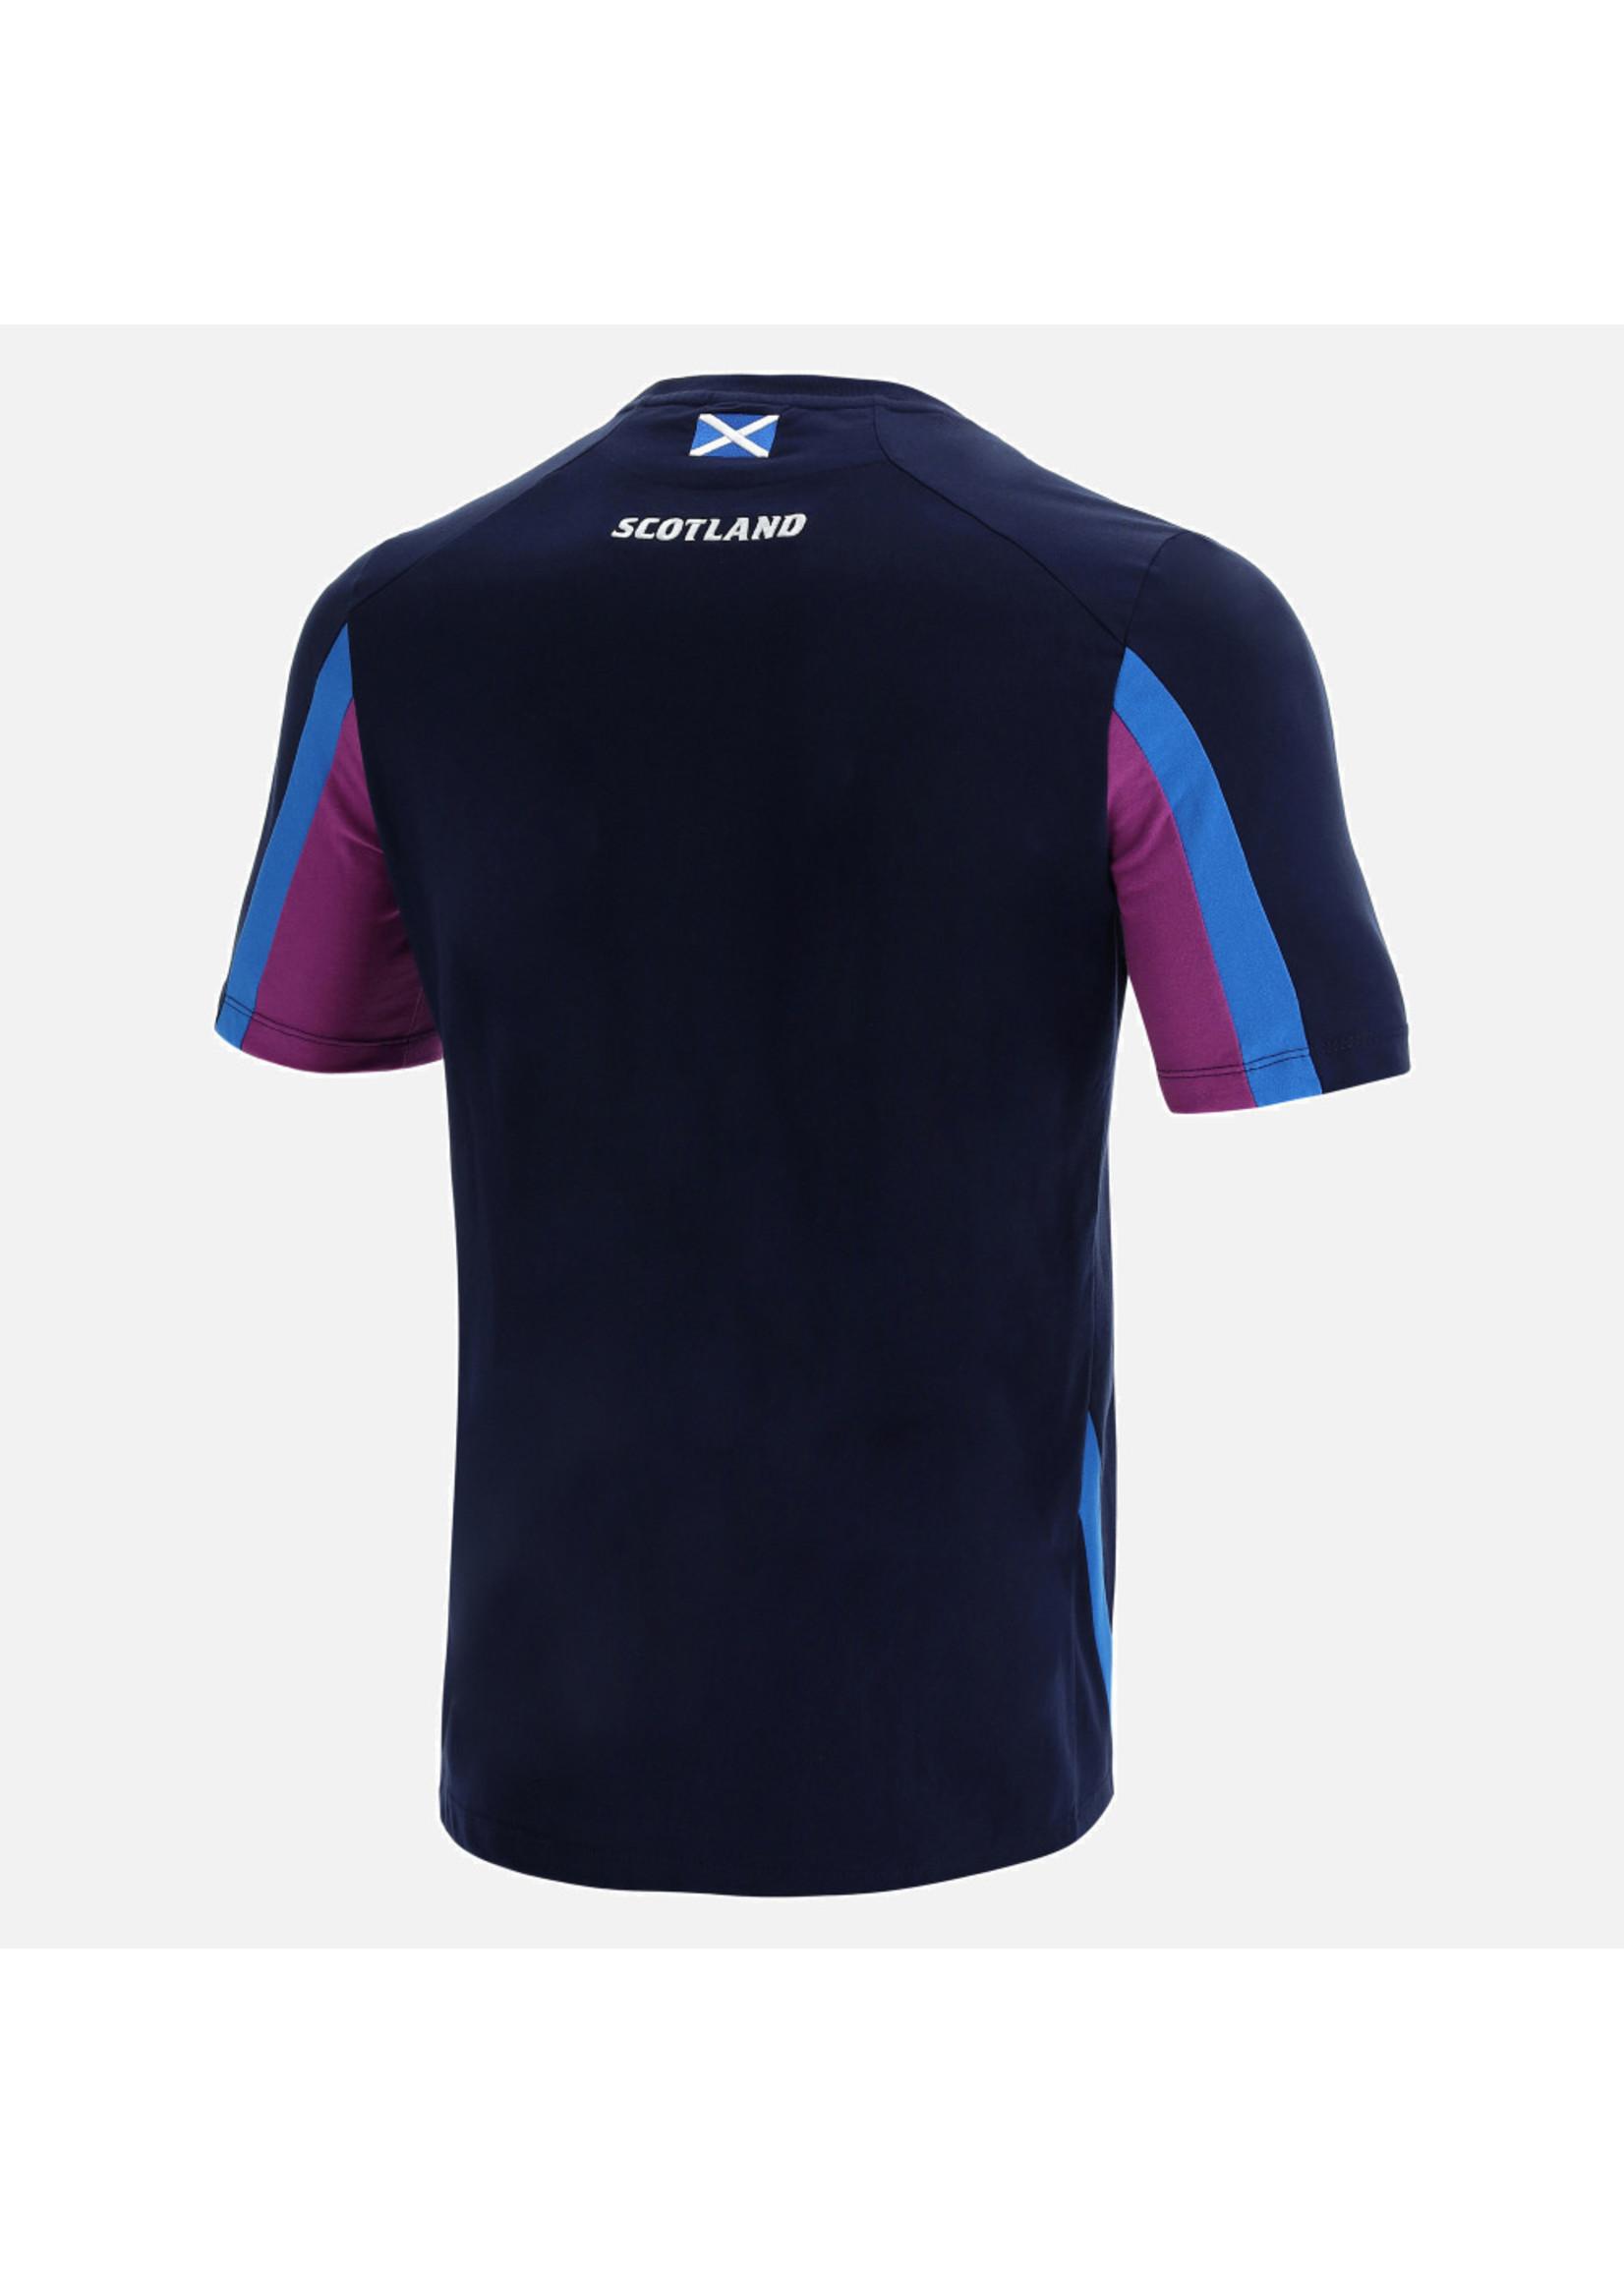 Macron Macron Scotland Rugby - Junior Official Travel T Shirt (2021/22)  Navy/Purple/Royal